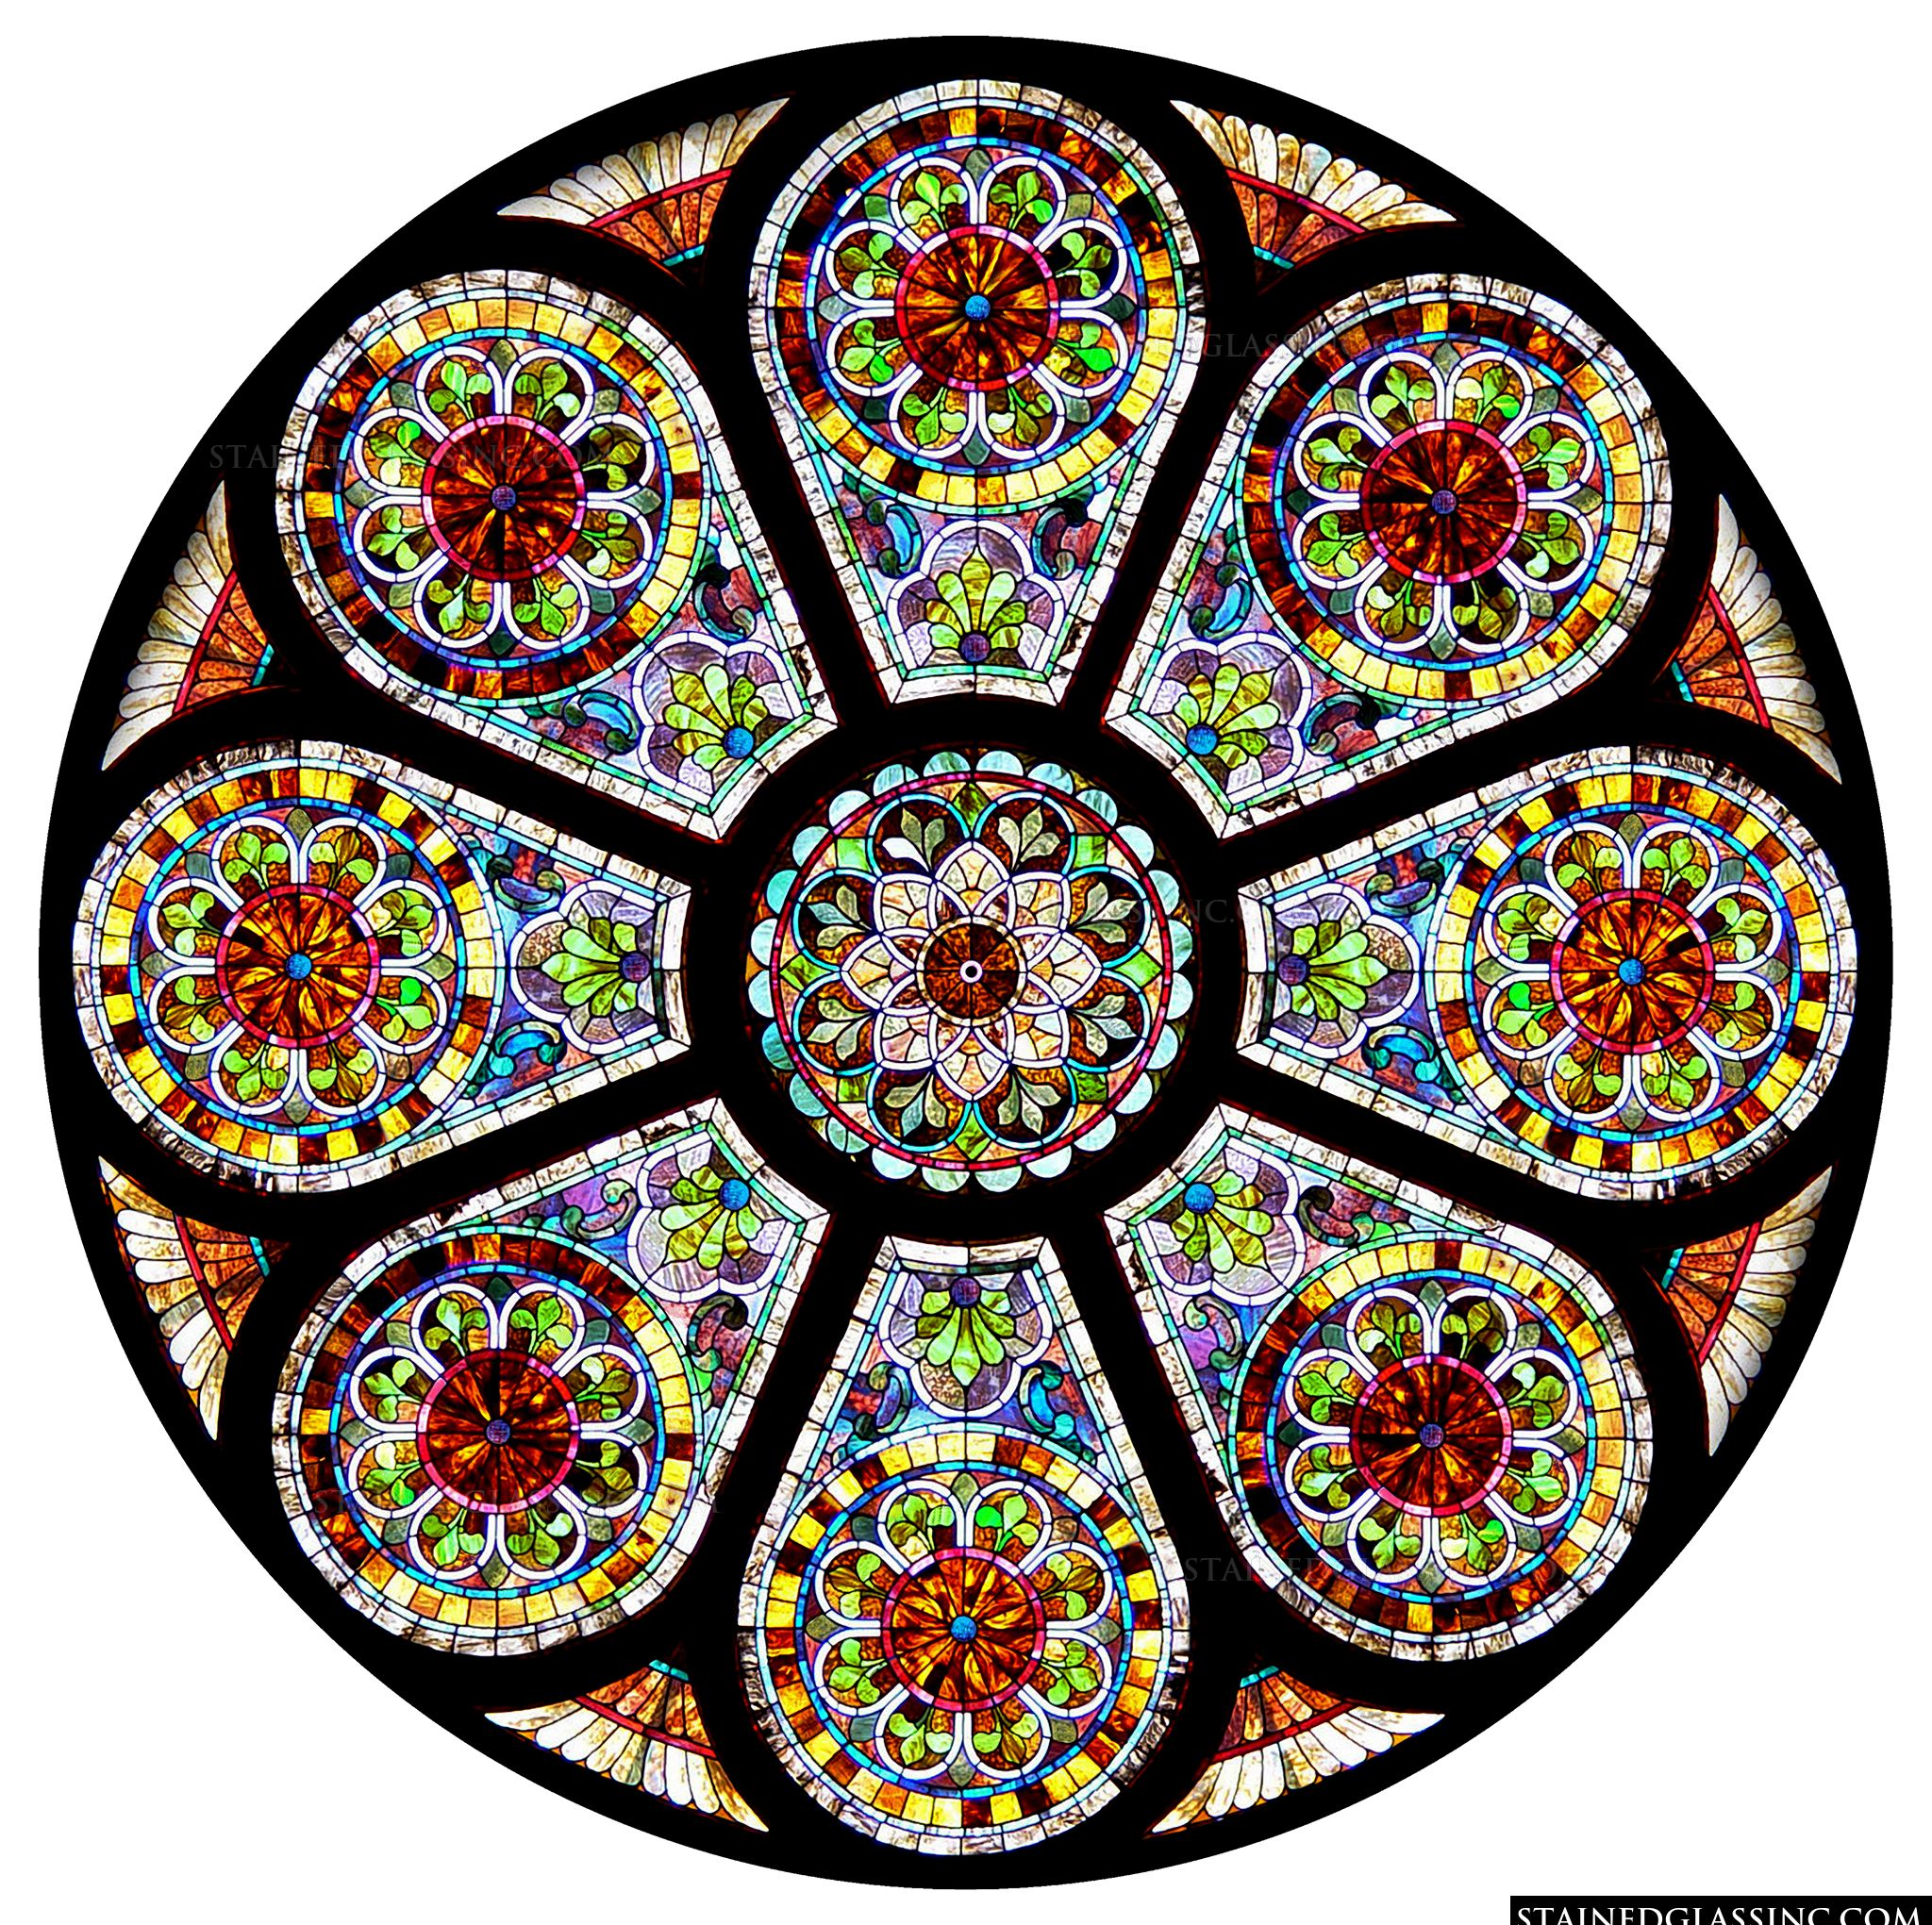 Intricately Detailed Rose Window